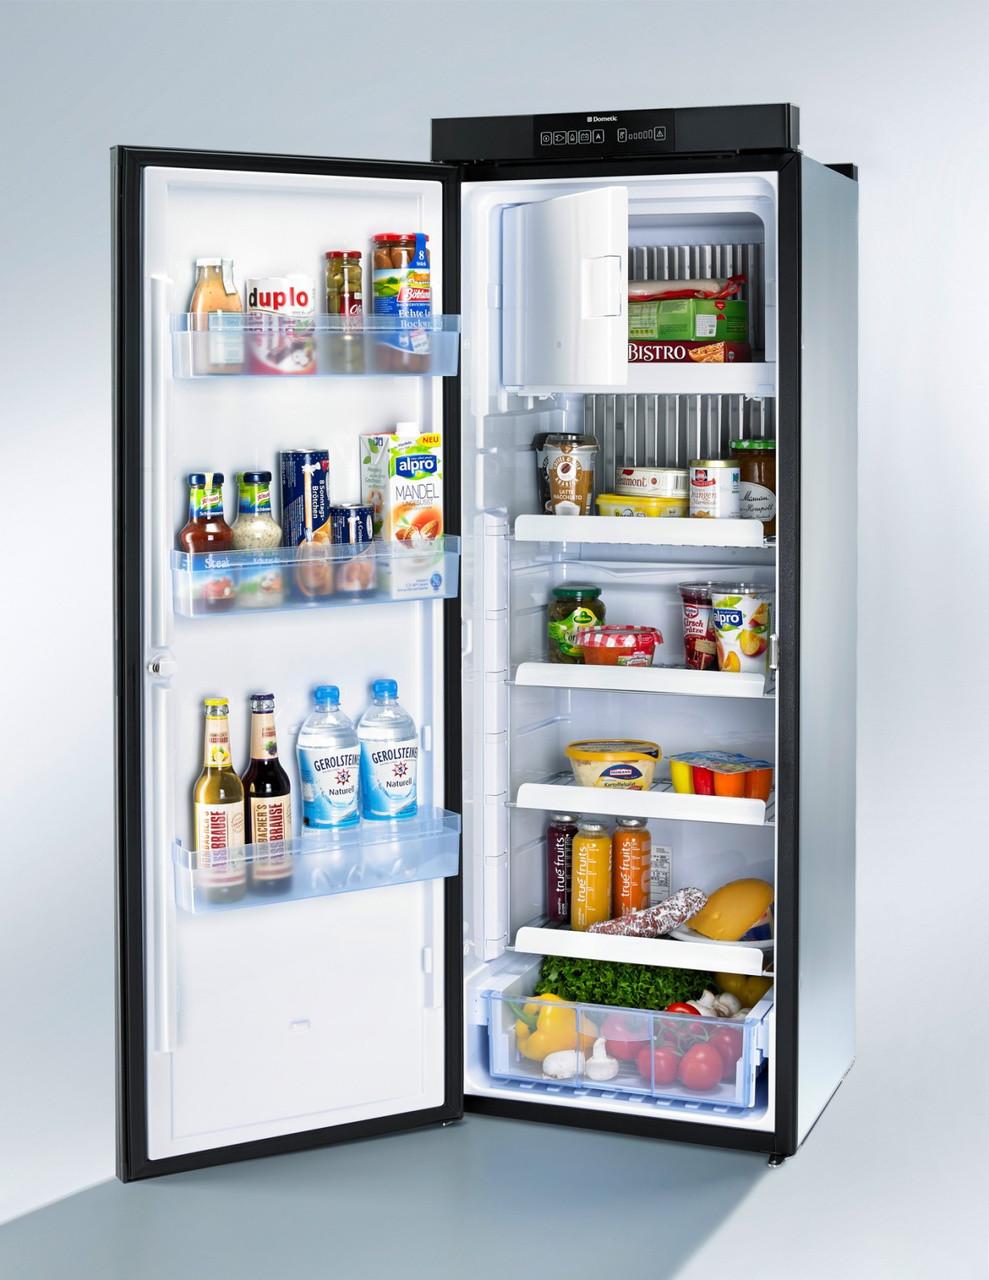 3 Way Refrigerator >> Dometic Rml 9430 9435 Fridge Freezer 12v Gas 240v